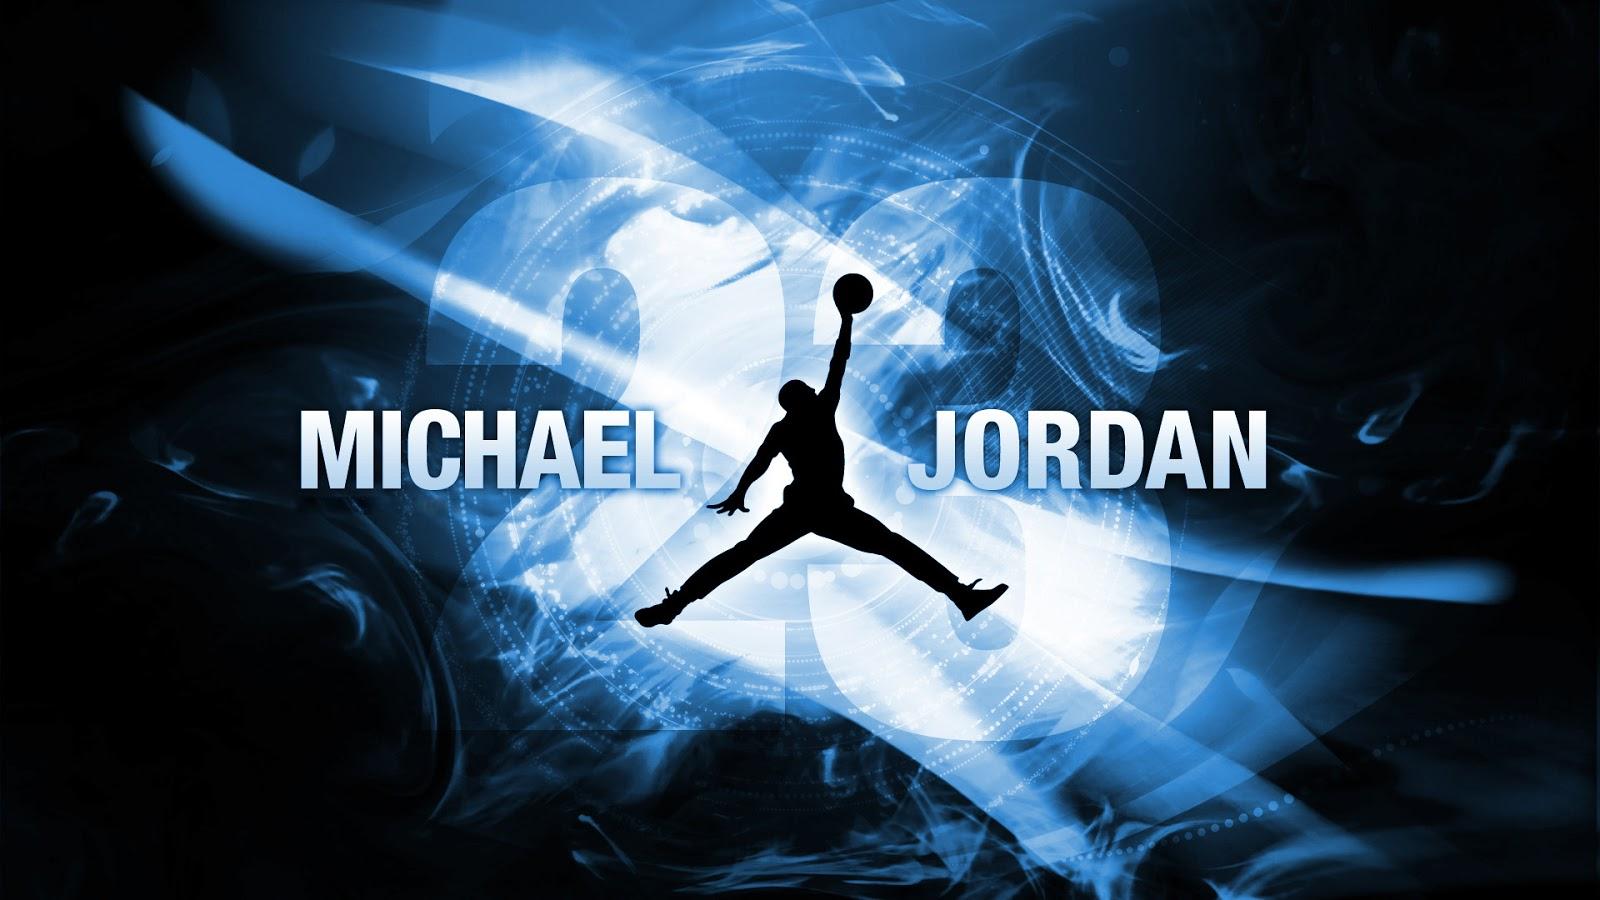 Michael Jordan Wallpaper Hd Hd Wallpapers Michael Jordan Wallpapers